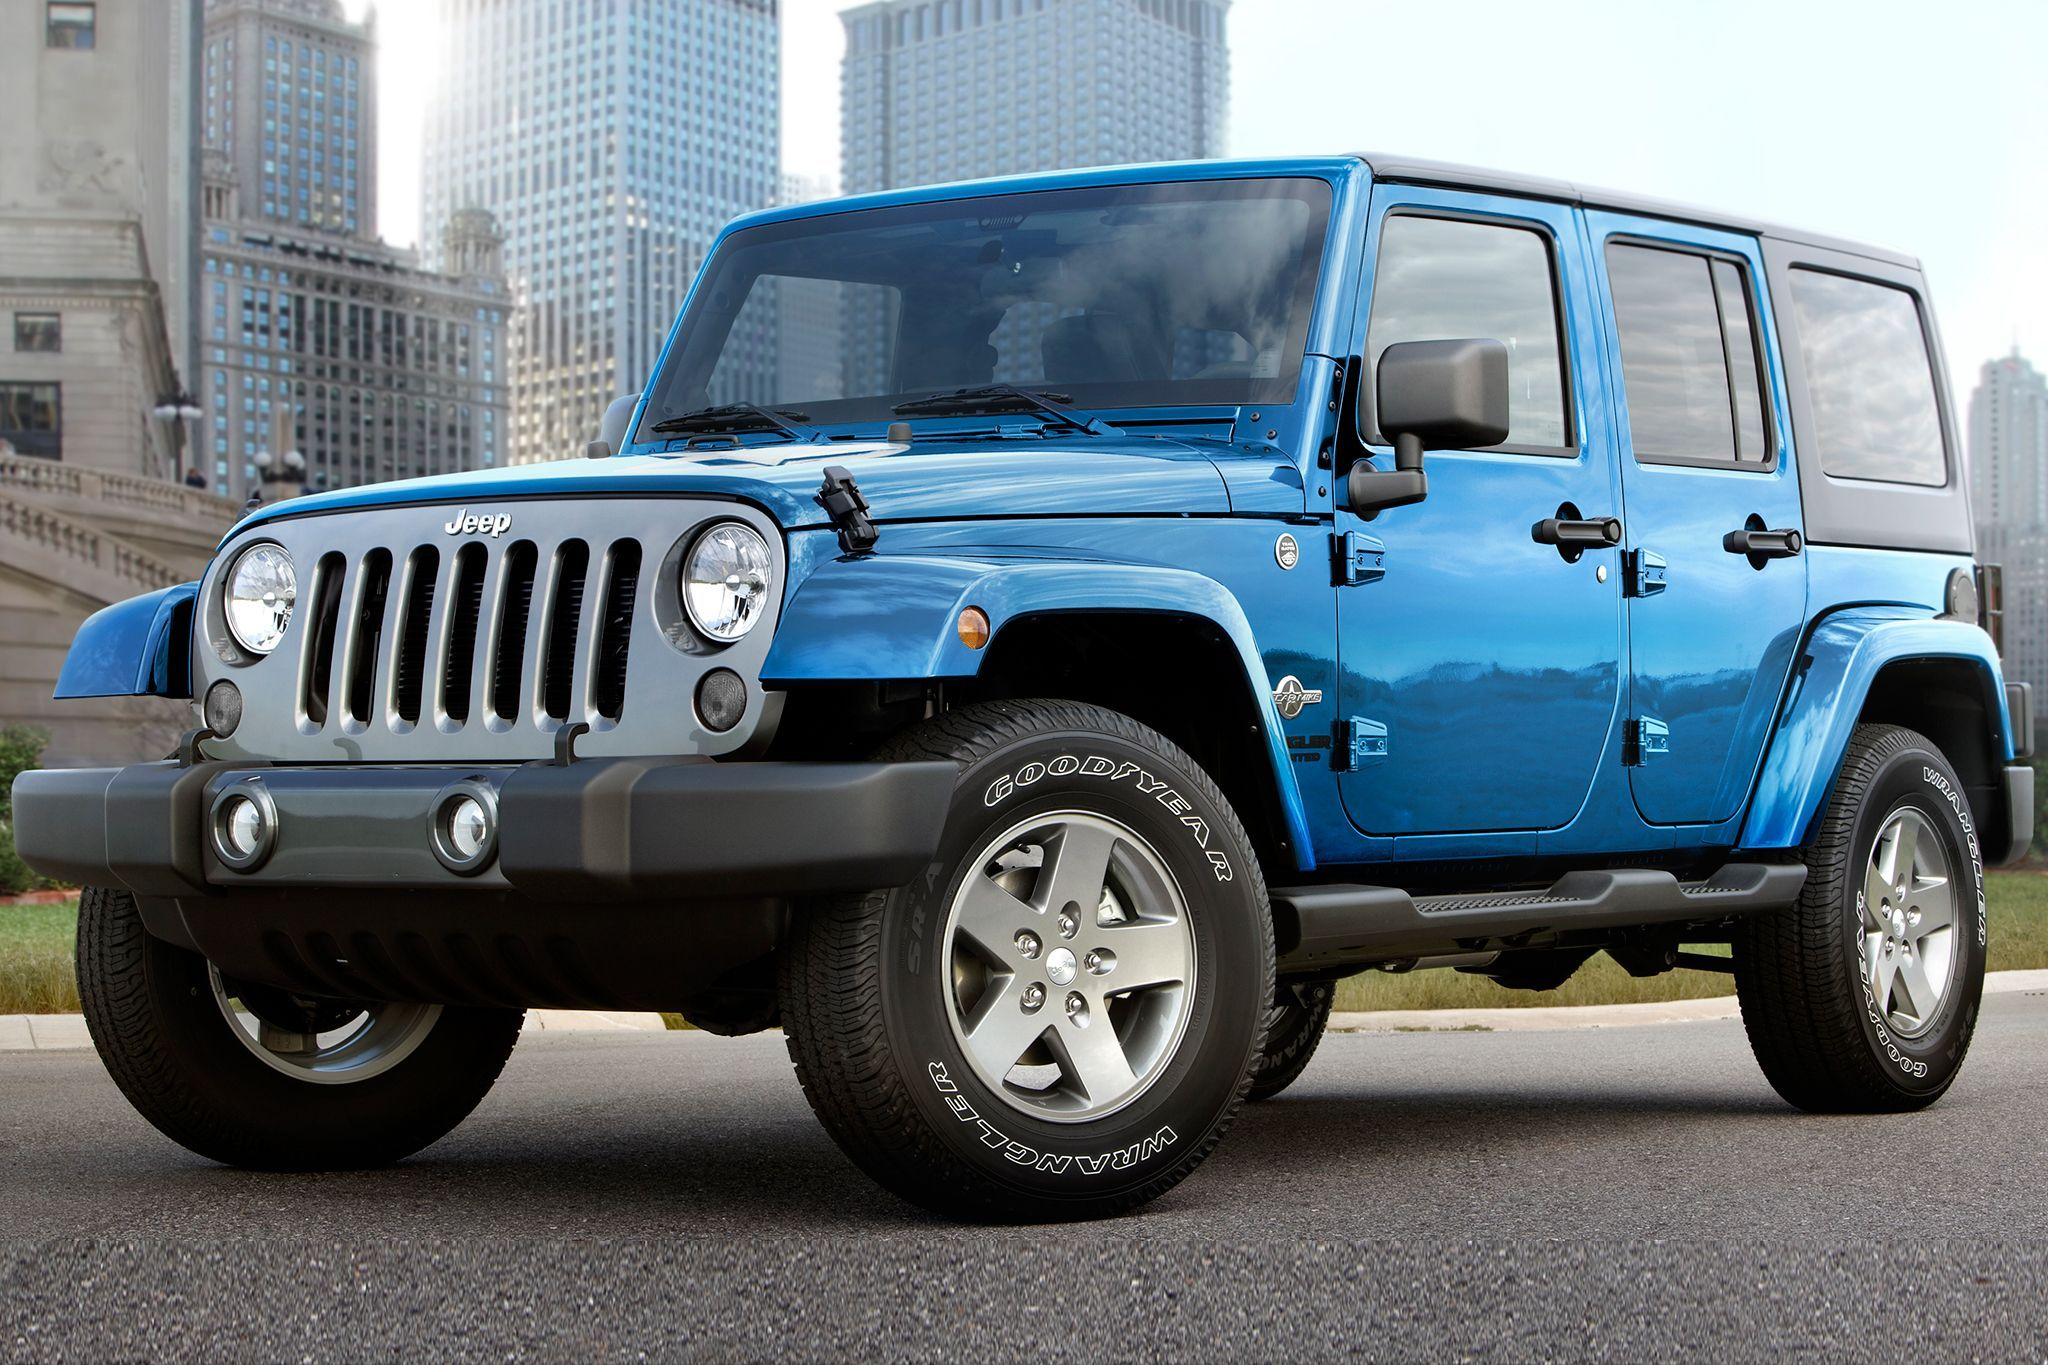 2017 jeep wrangler concept design 2017 - 2017 Jeep Wrangler Will Keep Solid Axle Suspension